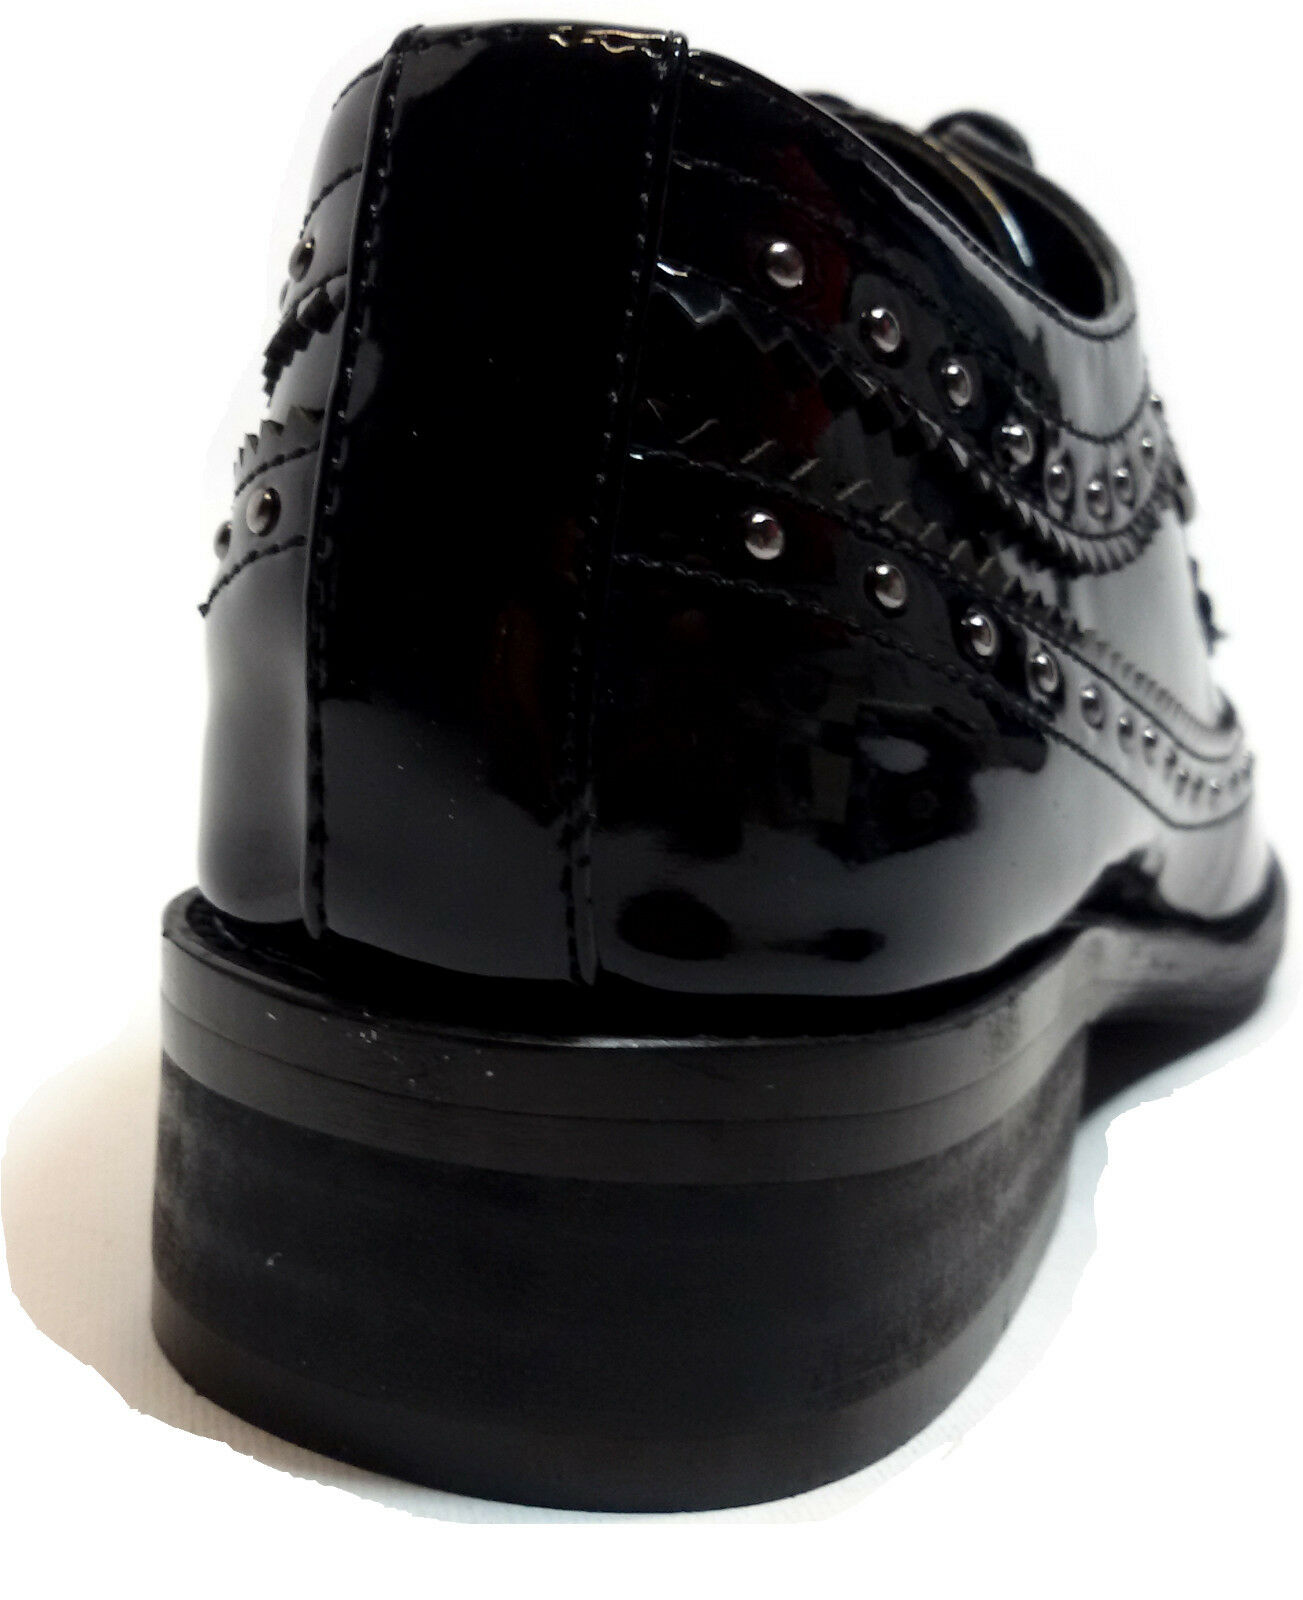 LAURA BIAGIOTTI Schuhe INGLESE Damens FRANCESINE VERNICE NERO INGLESE Schuhe BORCHIE - 1583 d525ff